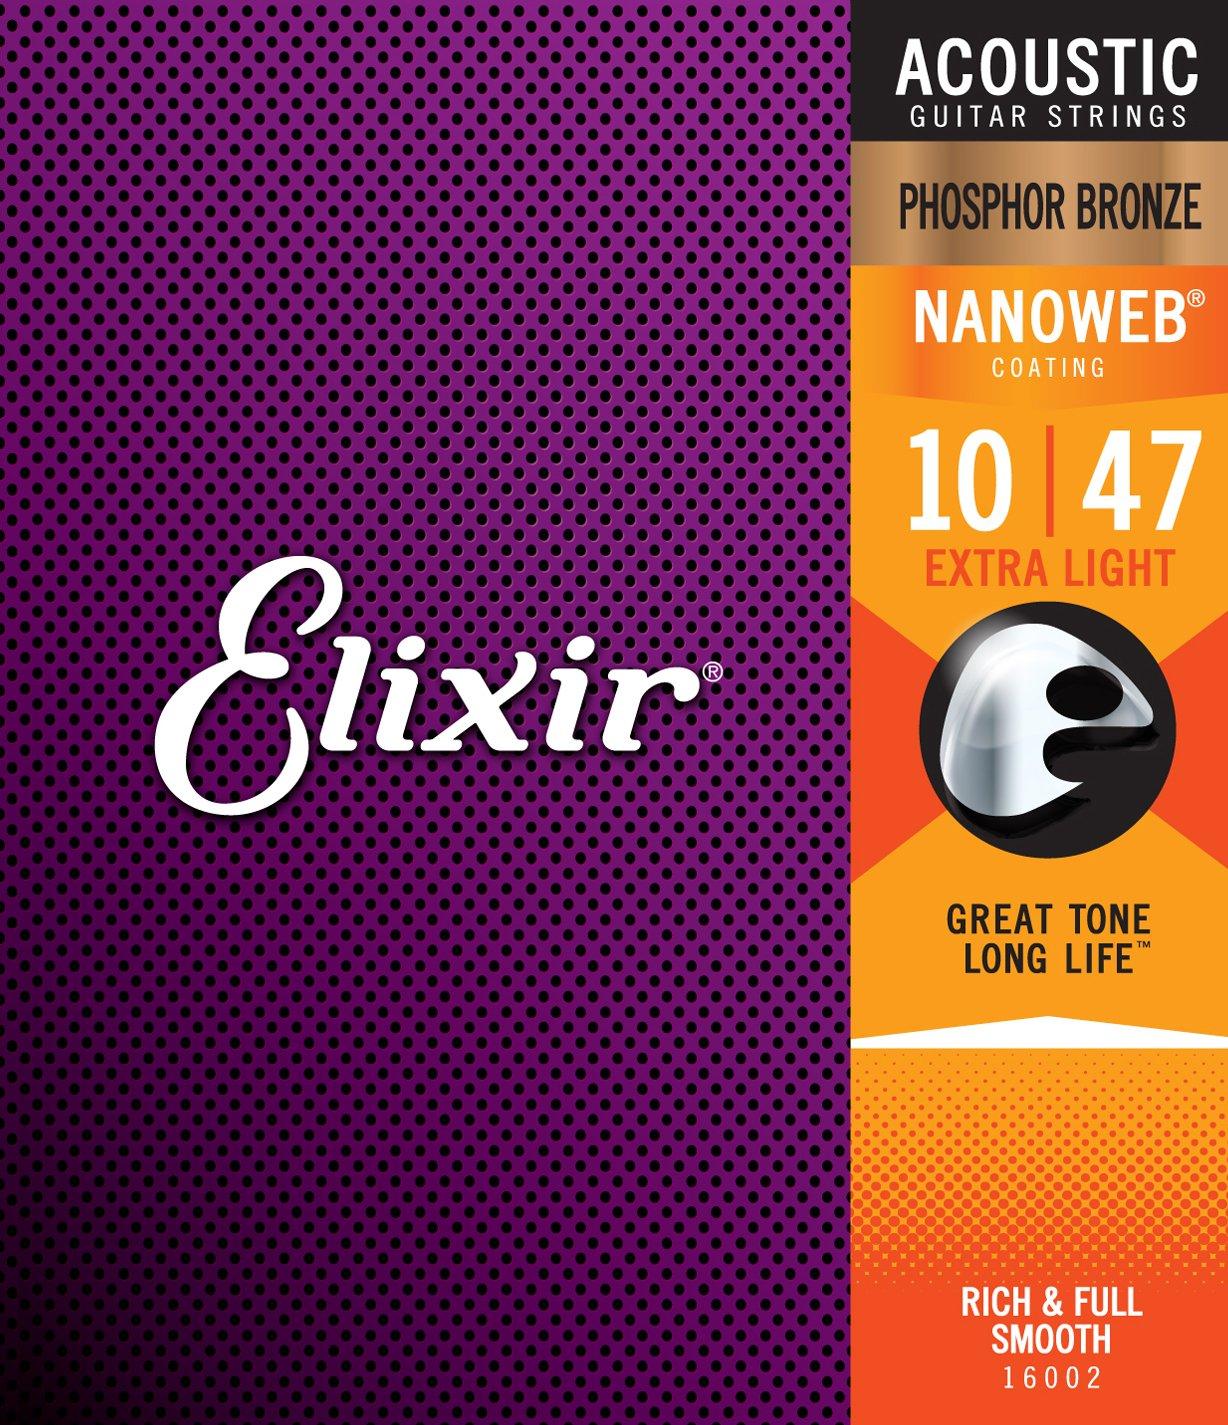 Elixir Phosphor Bronze 16002 Acoustic Guitar Strings, NANOWEB, Extra Light, 10-47